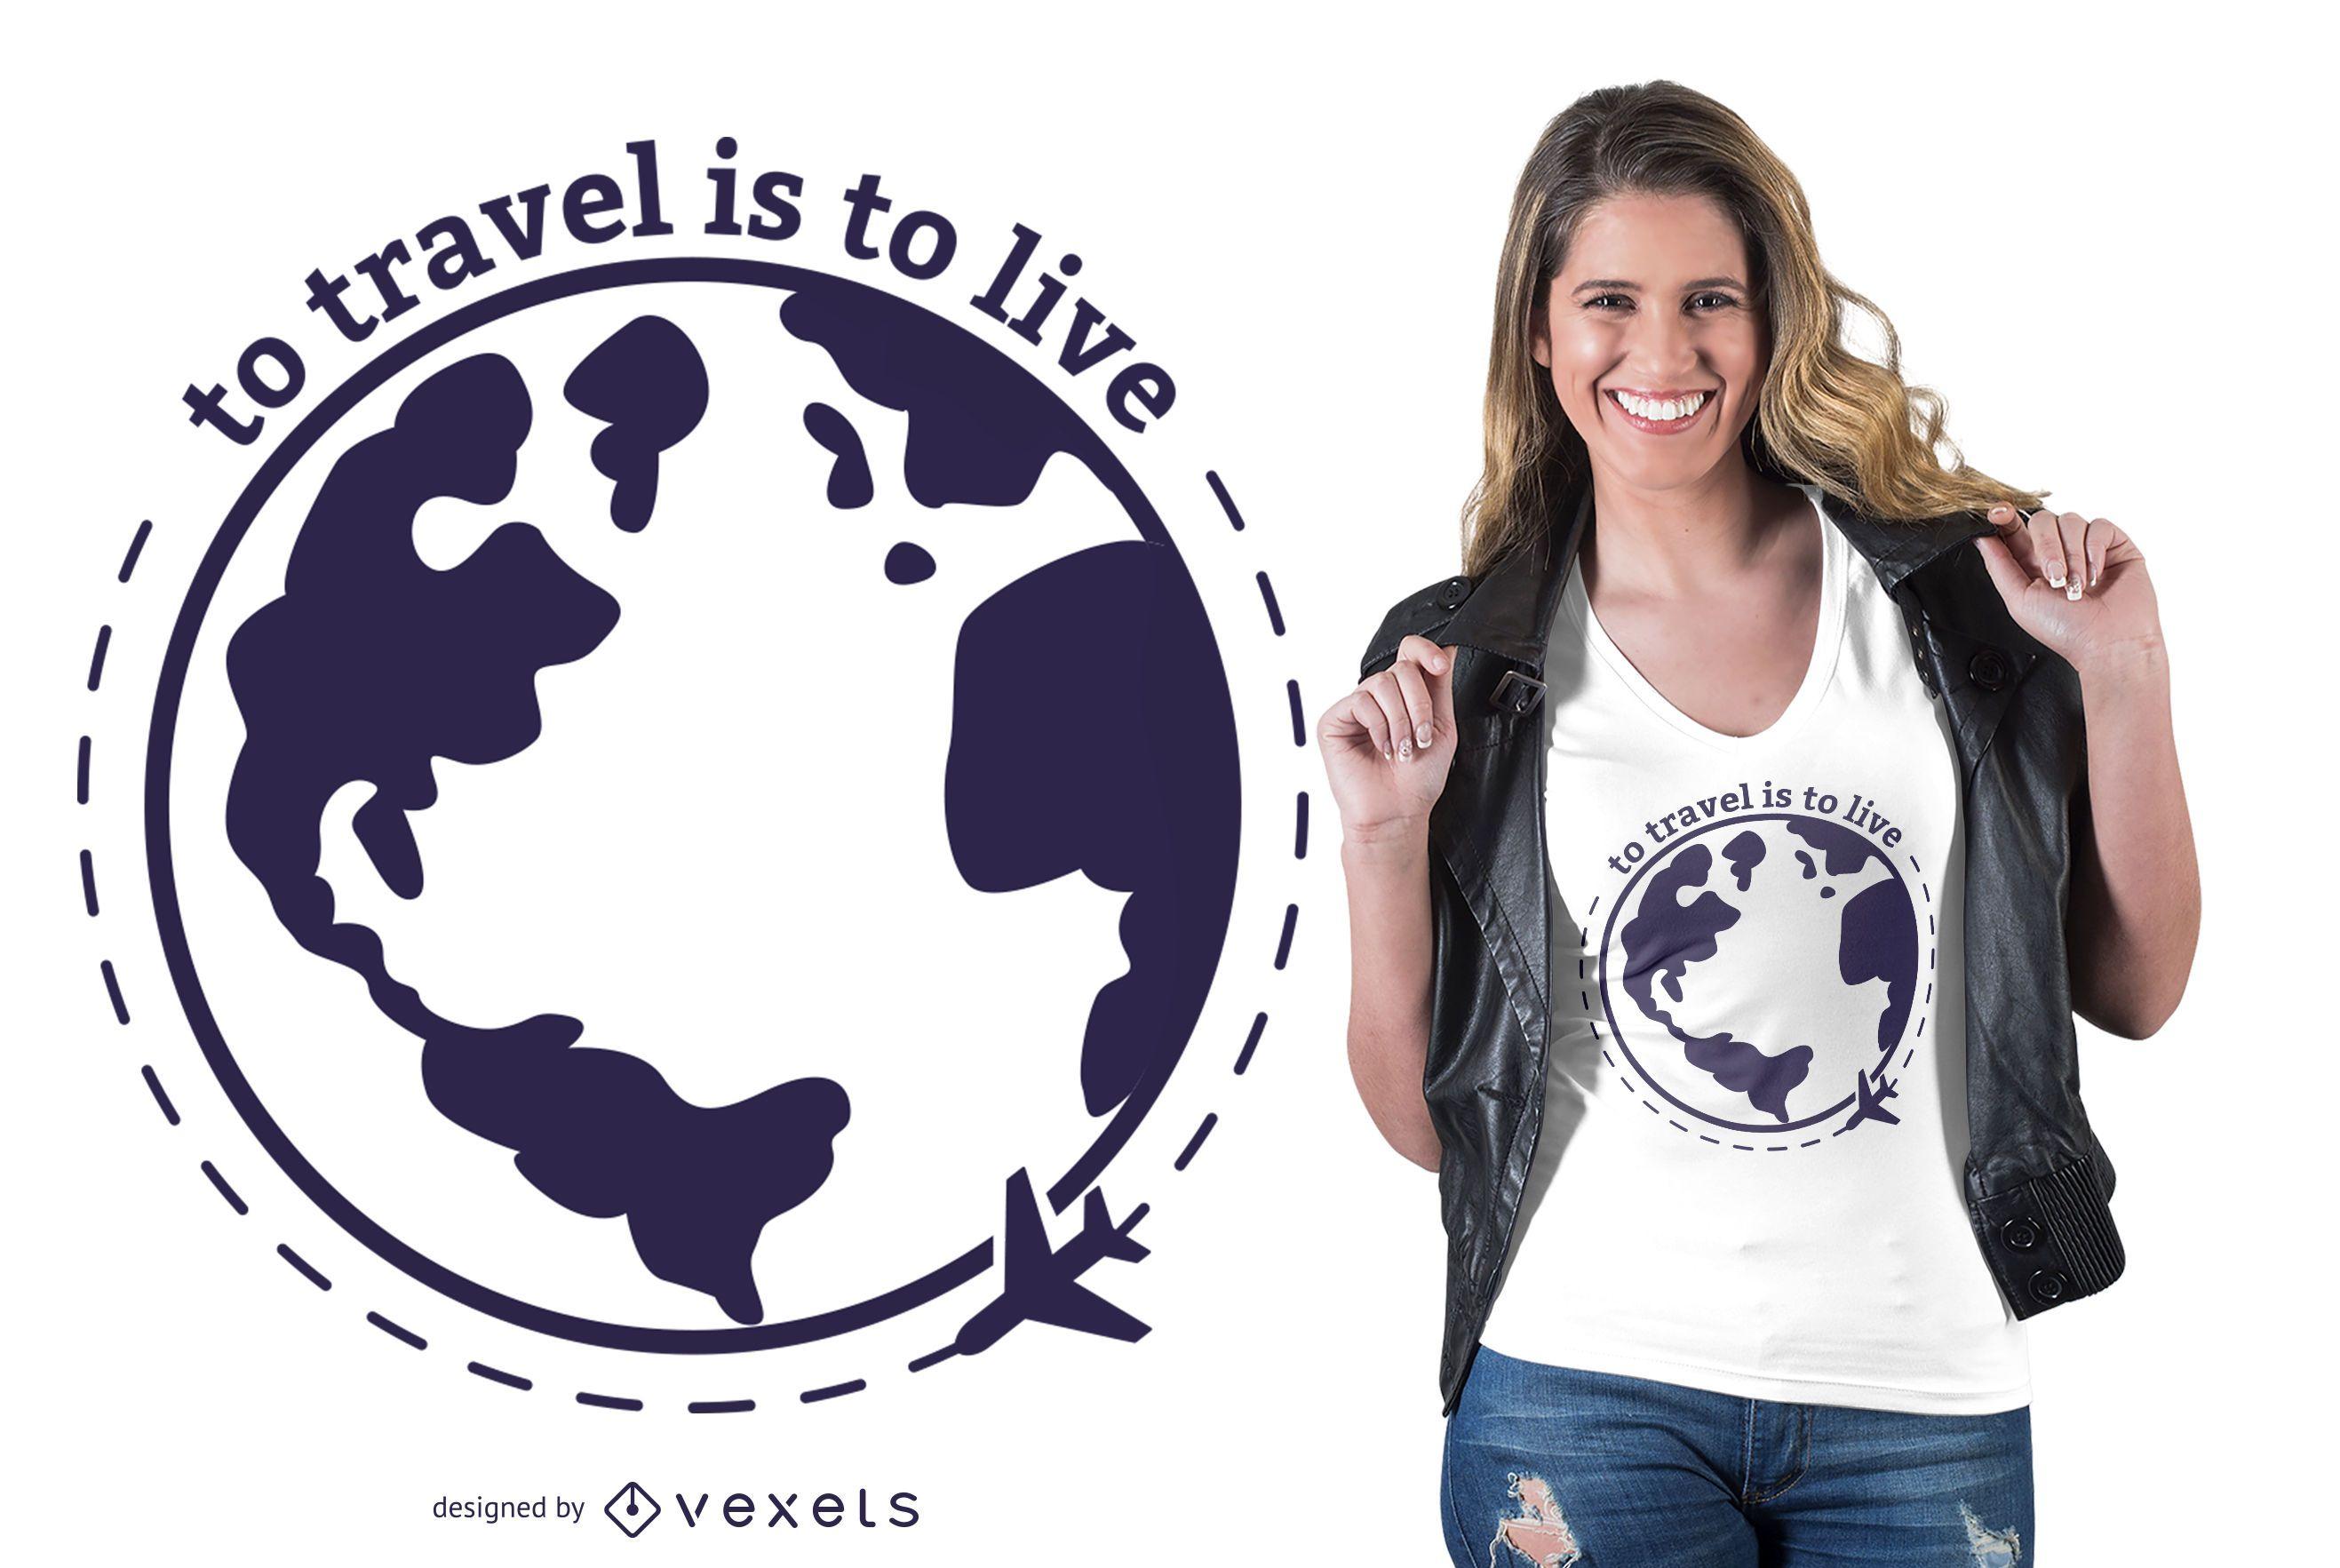 Travel is Life t-shirt design